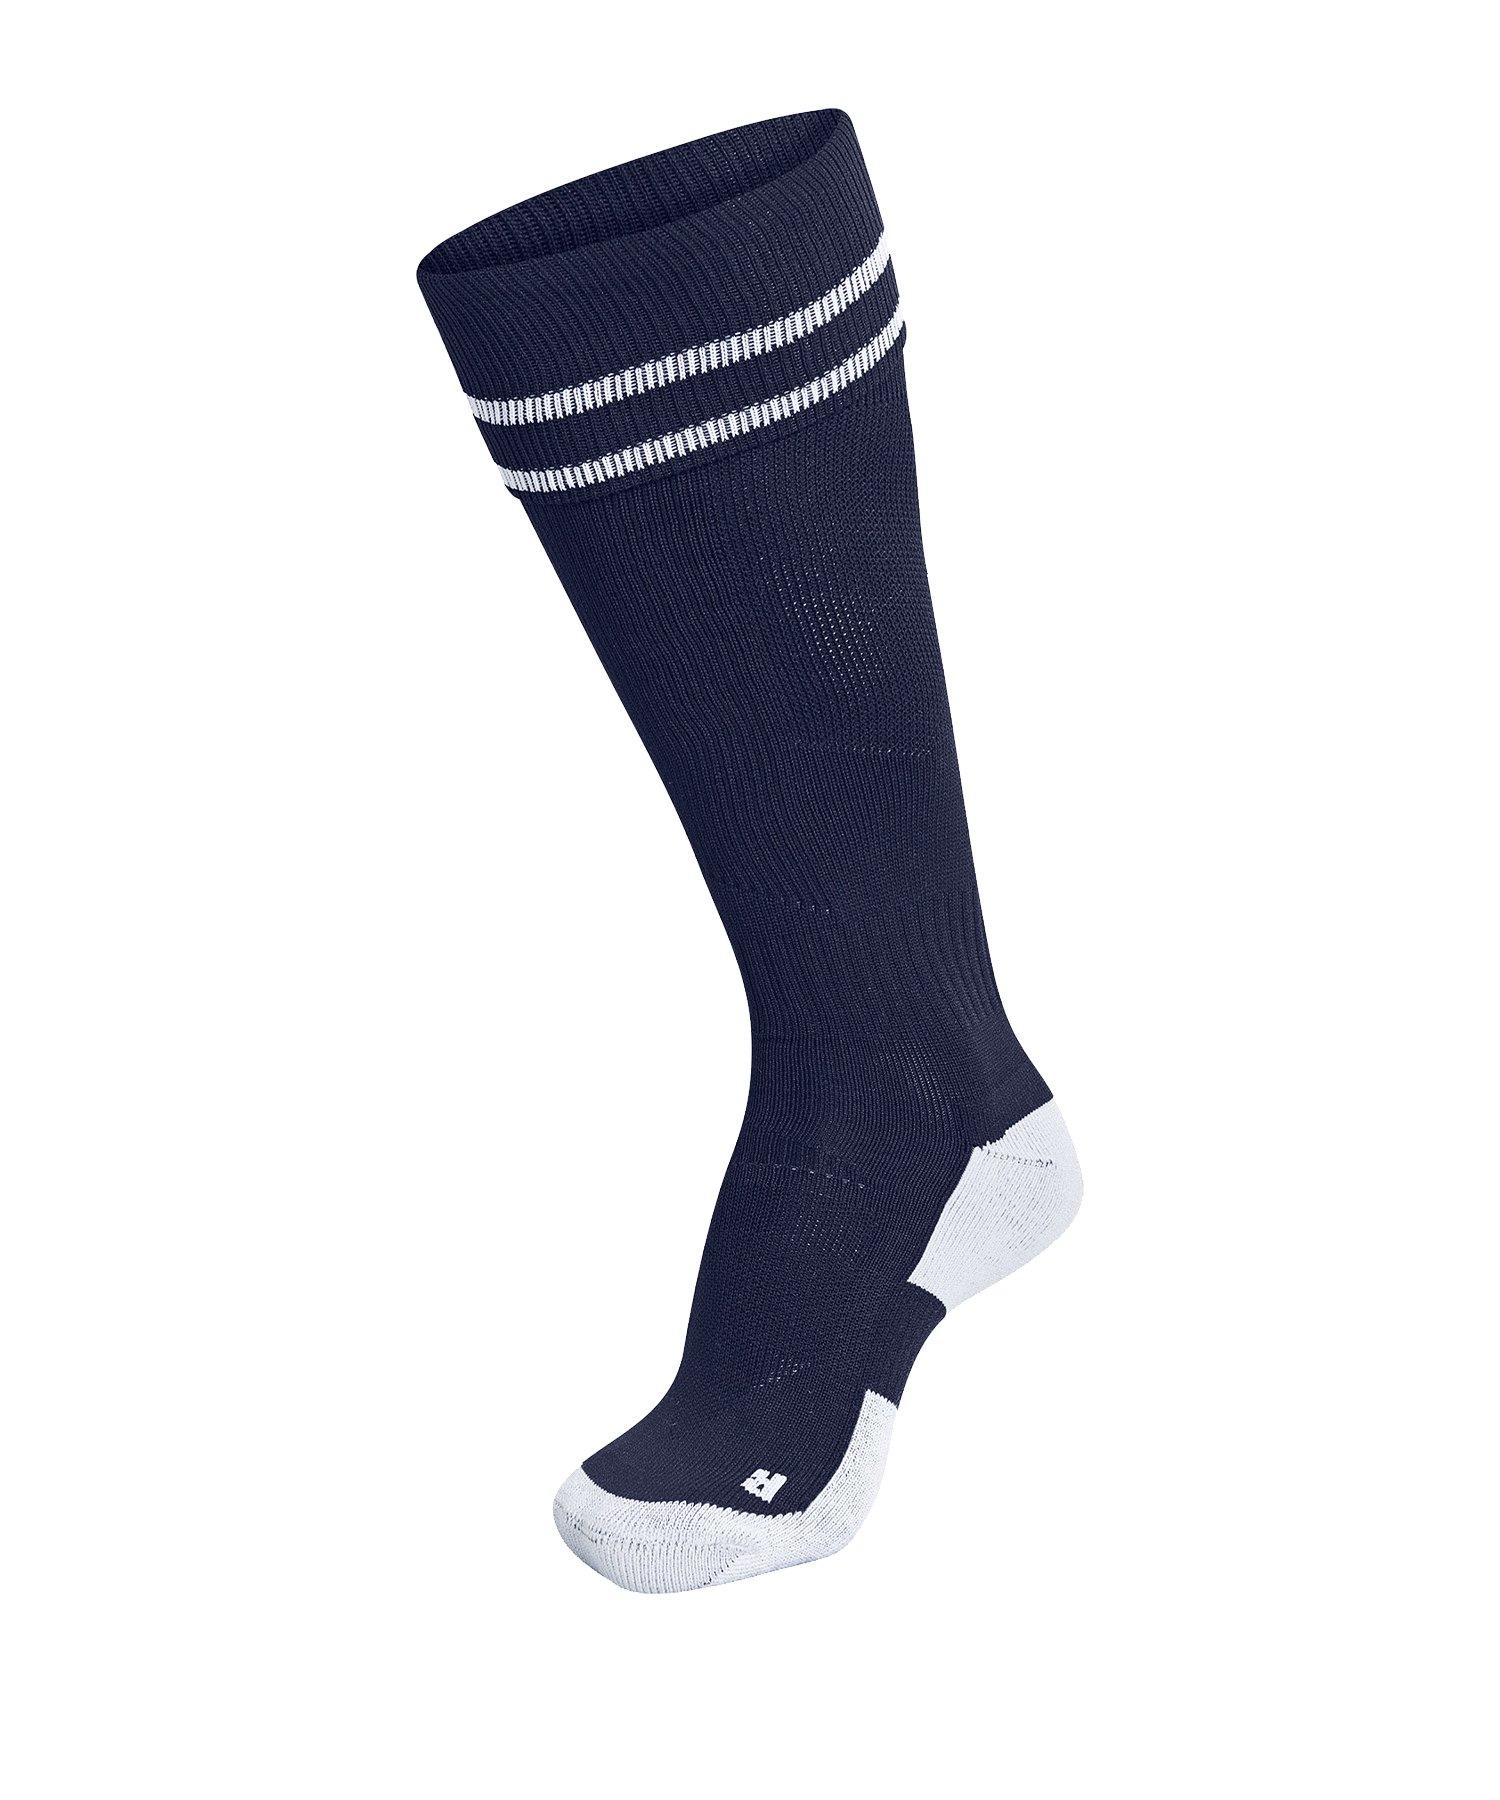 Hummel Football Sock Socken Blau F7929 - Blau